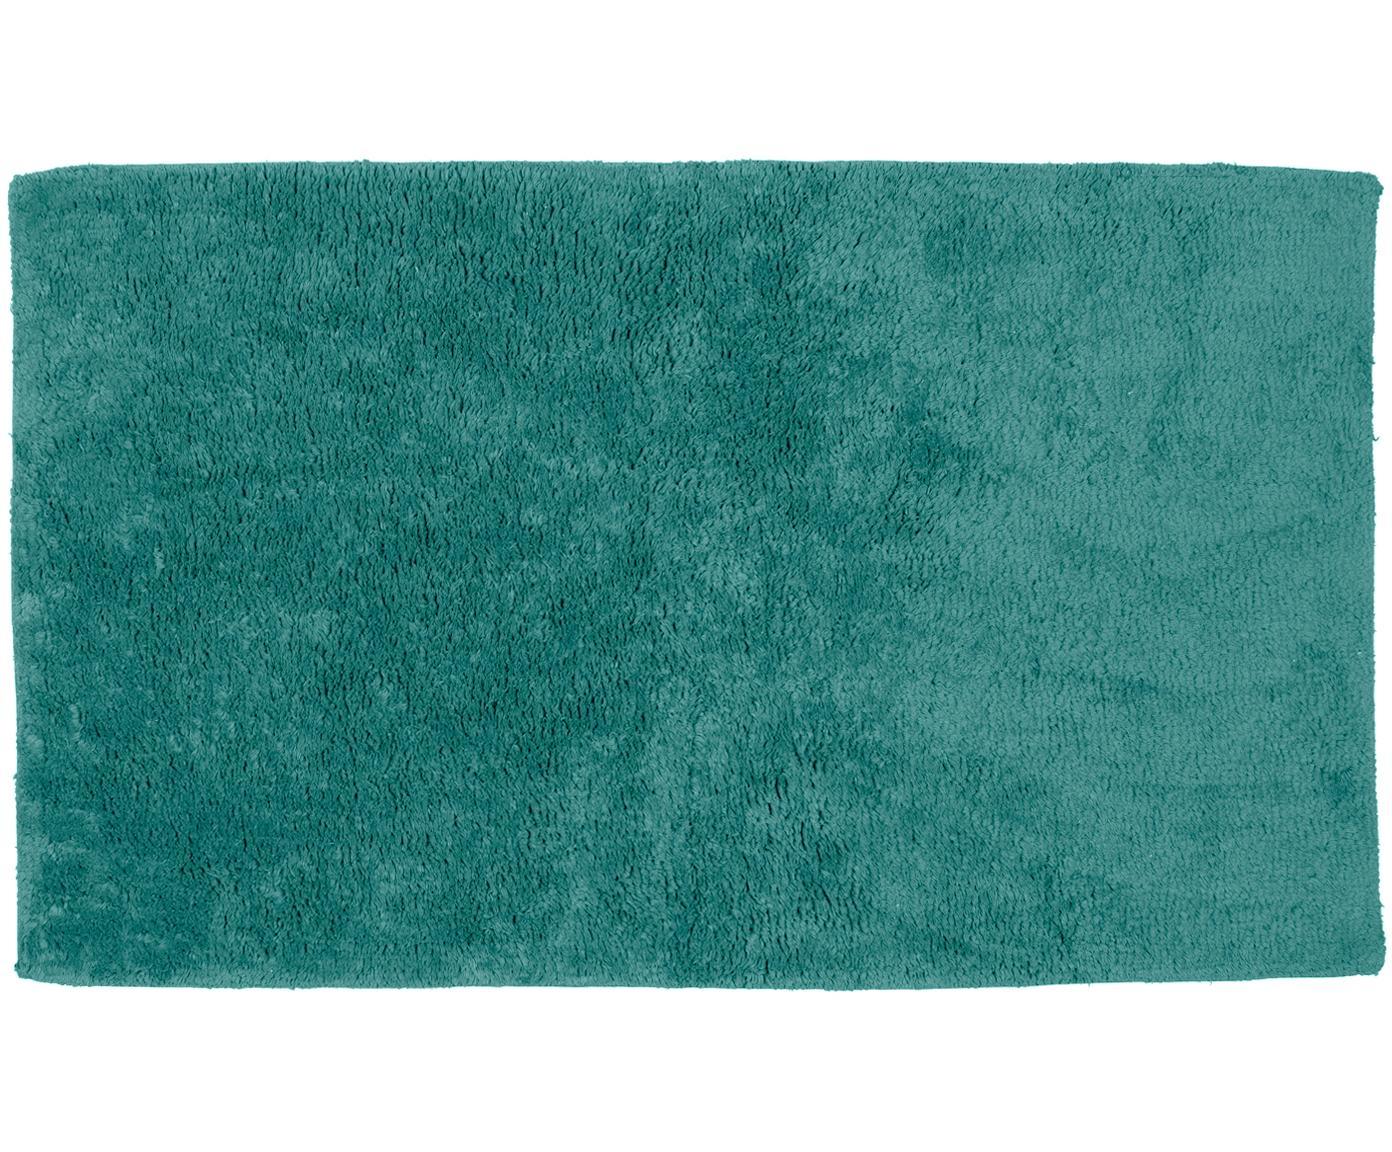 Grotere badmat Luna in turquoise, Smaragdgroen, 70 x 120 cm